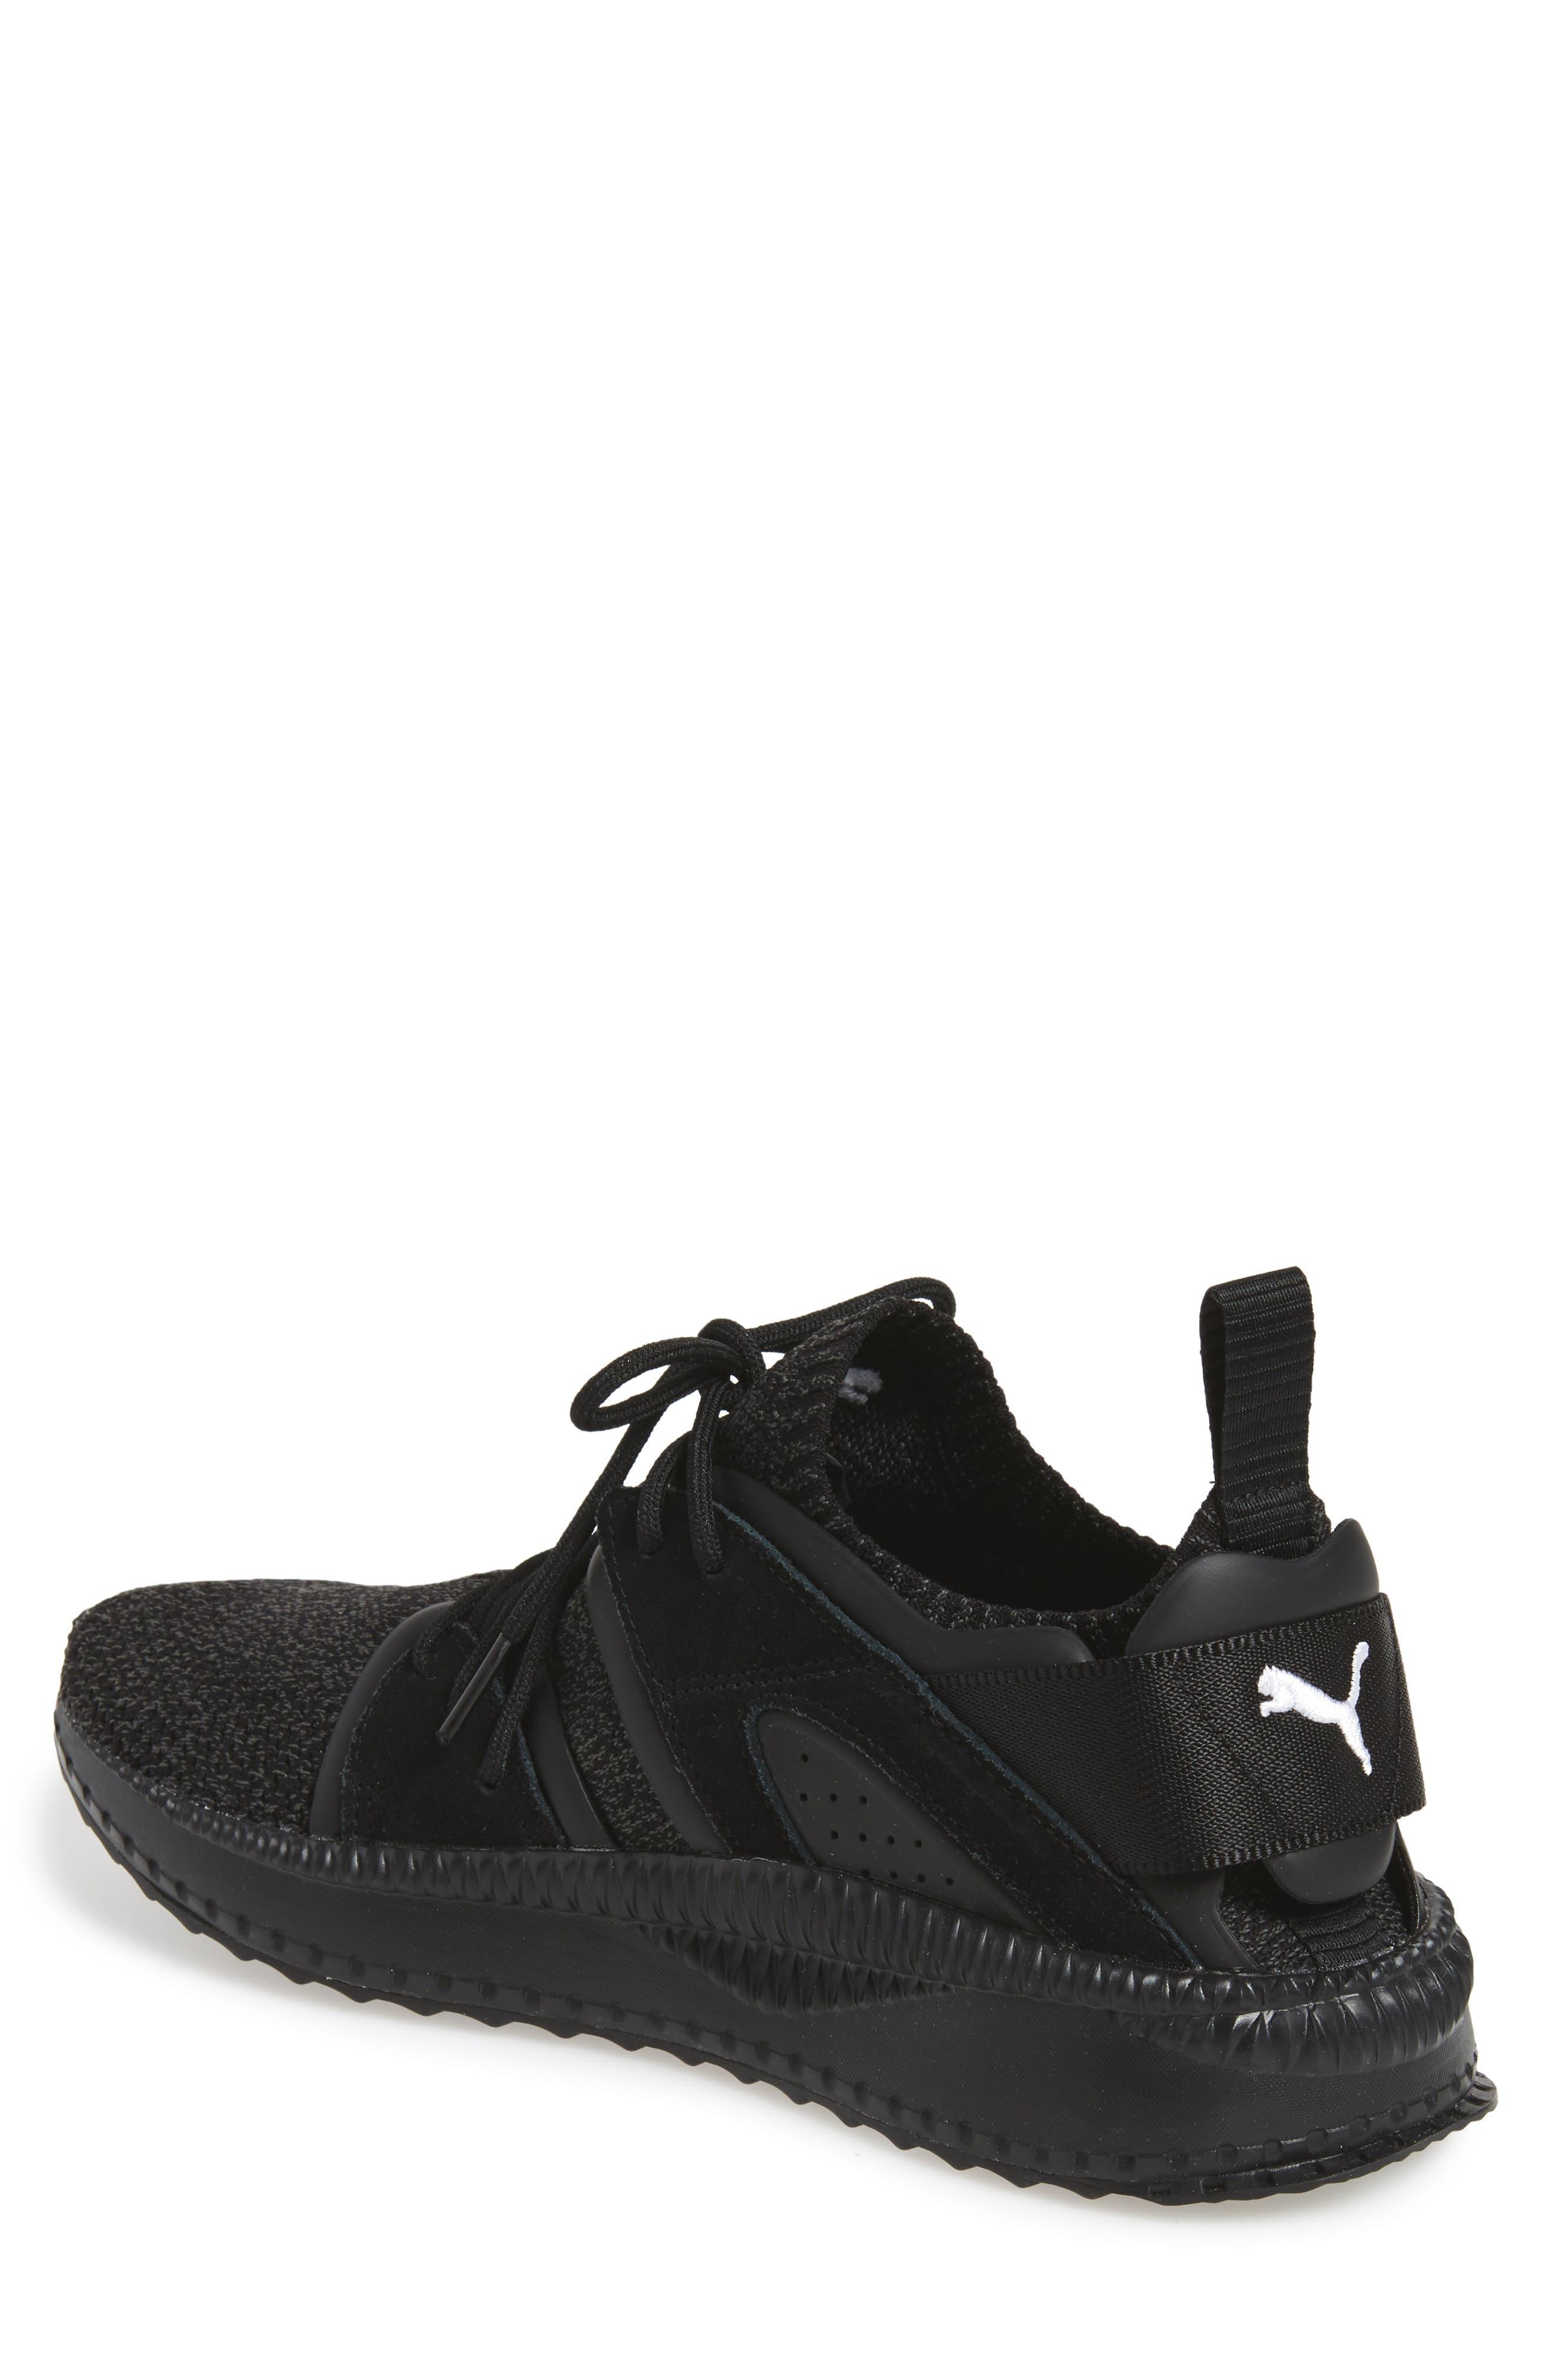 Tsugi Blaze EvoKnit Sneaker,                             Alternate thumbnail 2, color,                             001